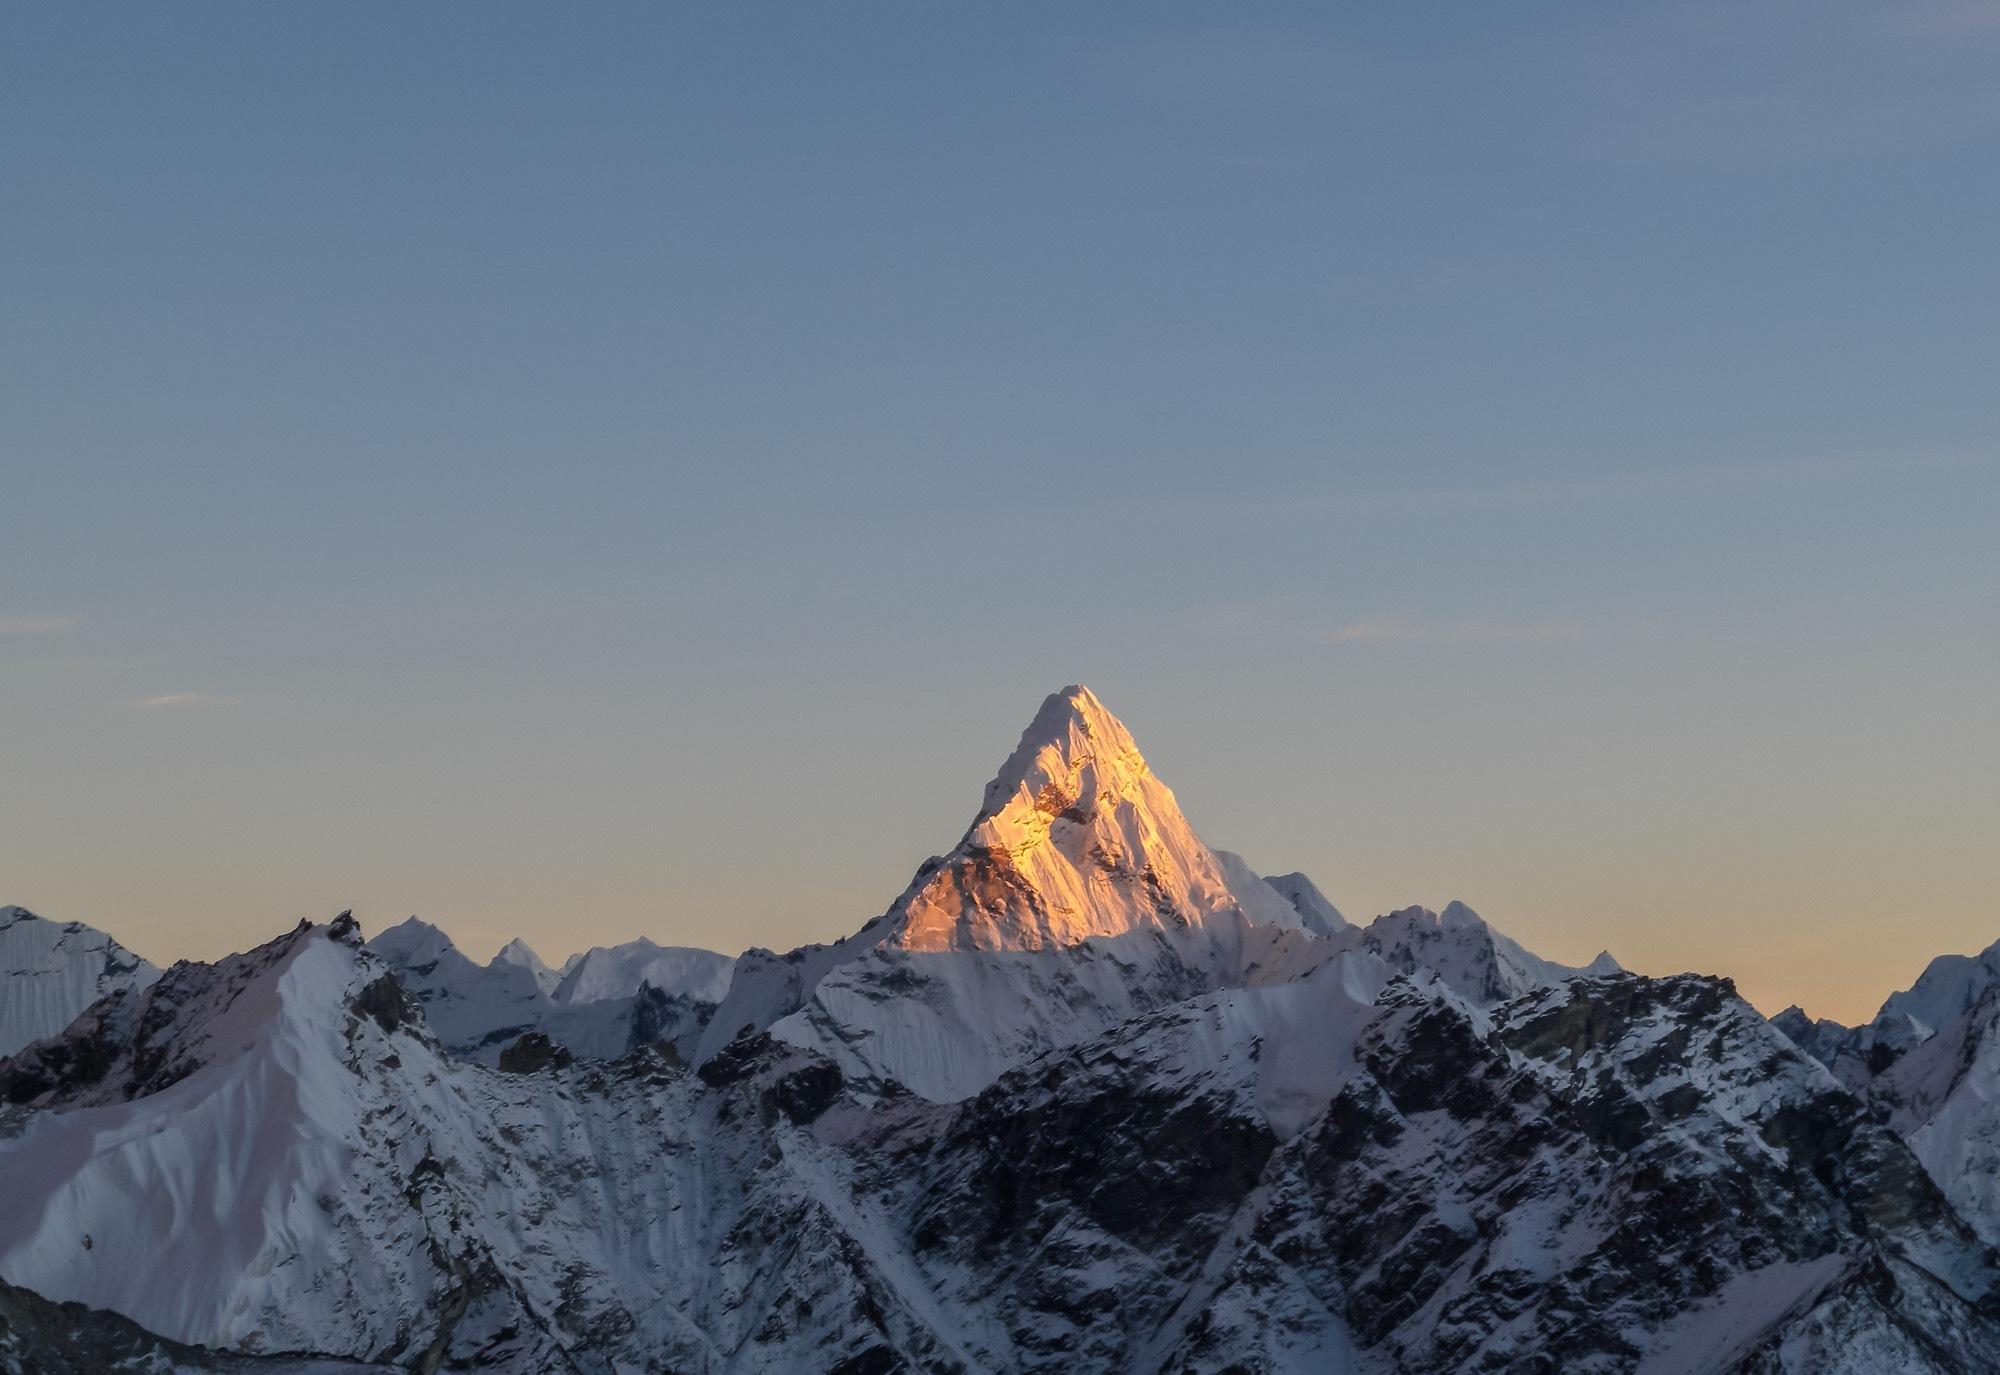 The highest mountain in the world, Everest and Himalaya neighborhood